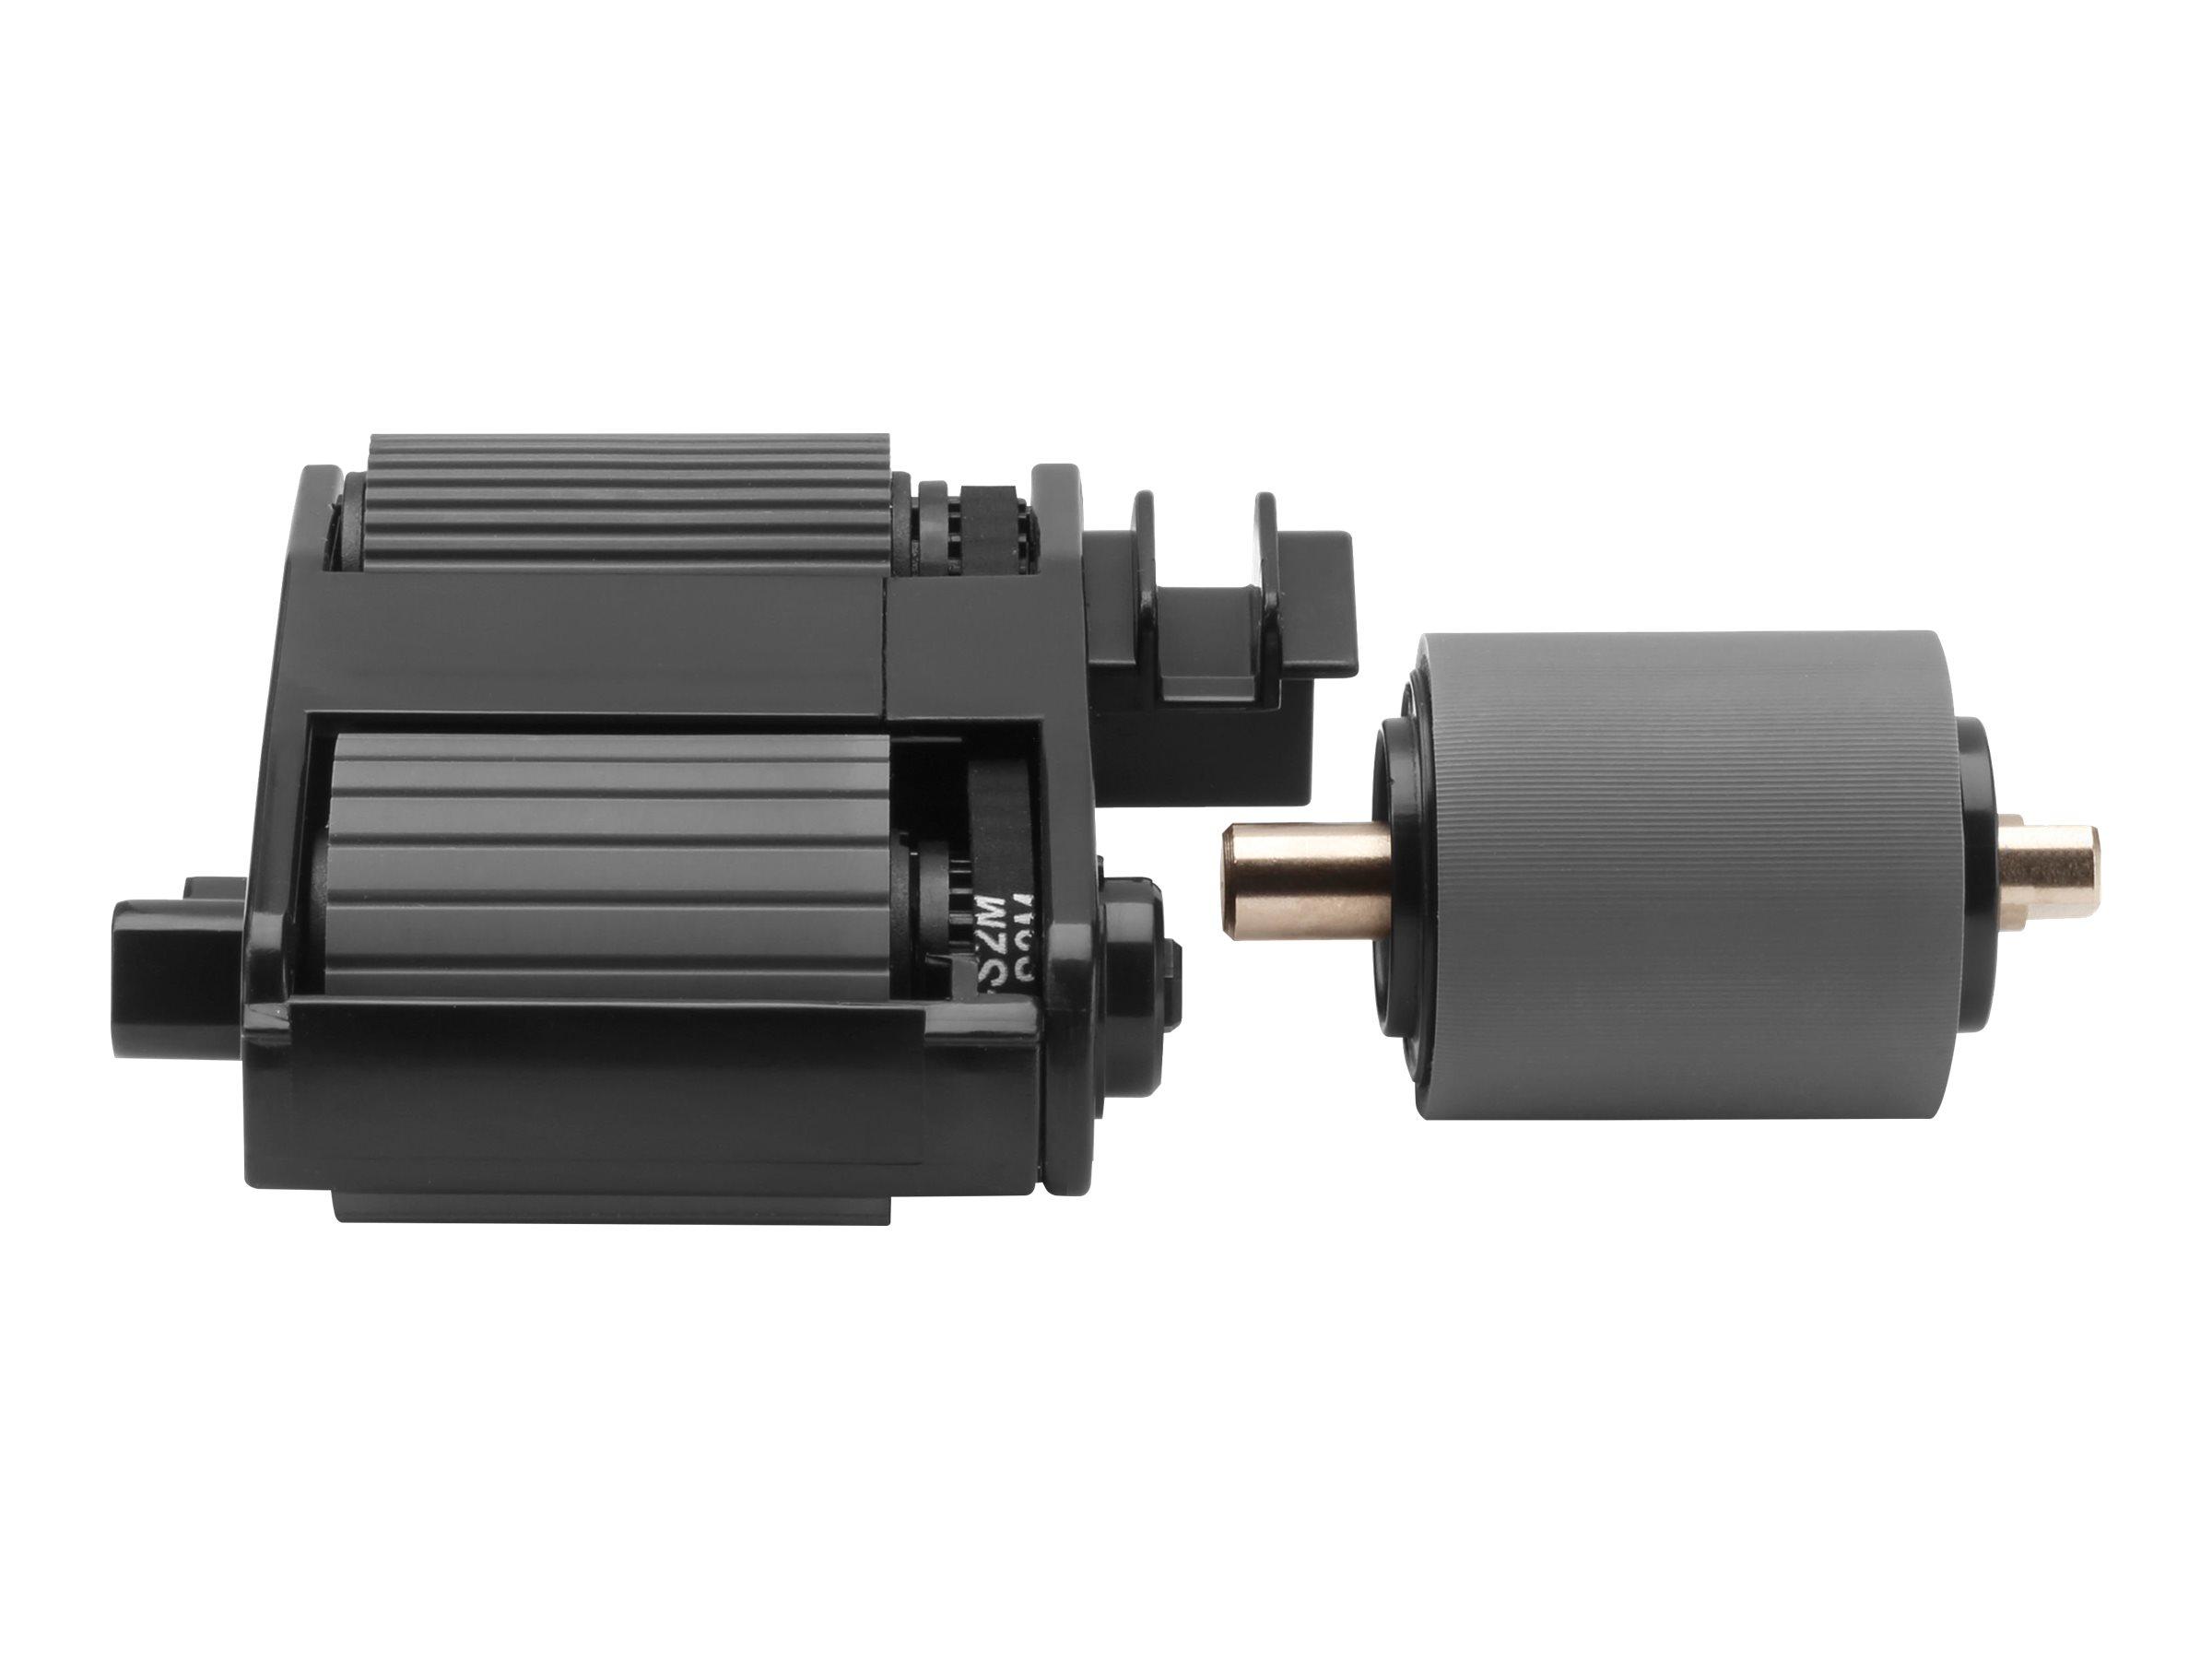 HP Scanjet ADF Roller Replacement Kit - Wartungskit - für ScanJet Enterprise Flow N9120 Flatbed Scanner, N9120 Document Flatbed